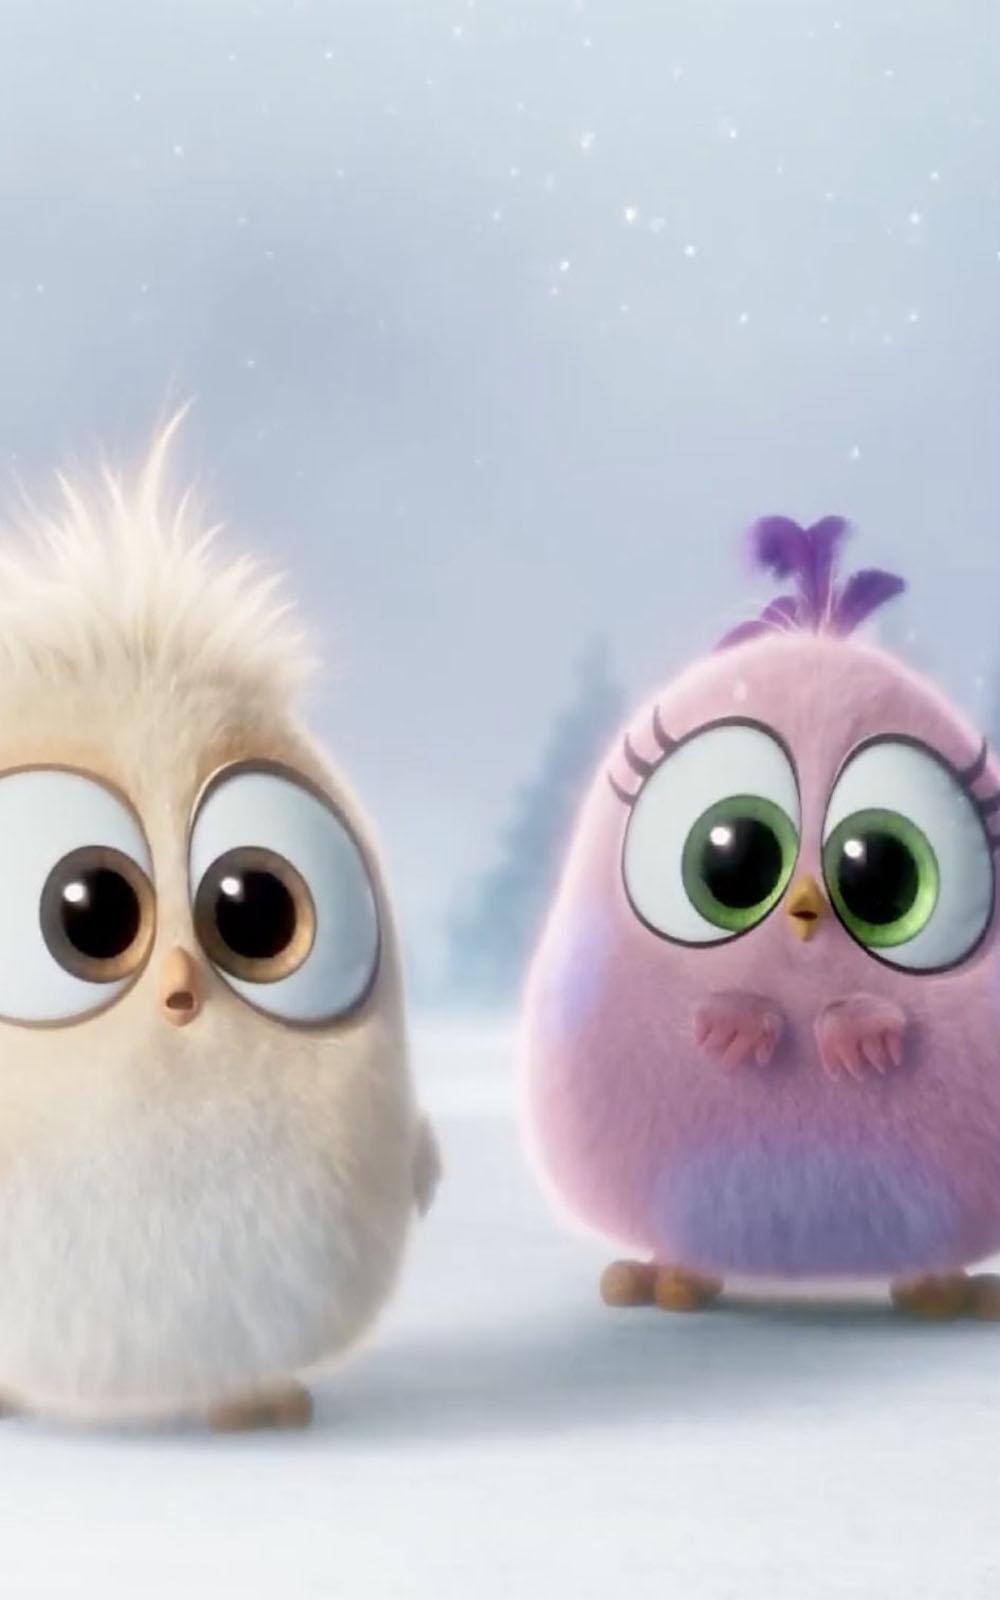 Beautiful Wallpaper Angry Mobile Hd - Cute-Angry-Birds-Mobile-Wallpaper  You Should Have_127523      .jpg?resize\u003d1000%2C1600\u0026ssl\u003d1